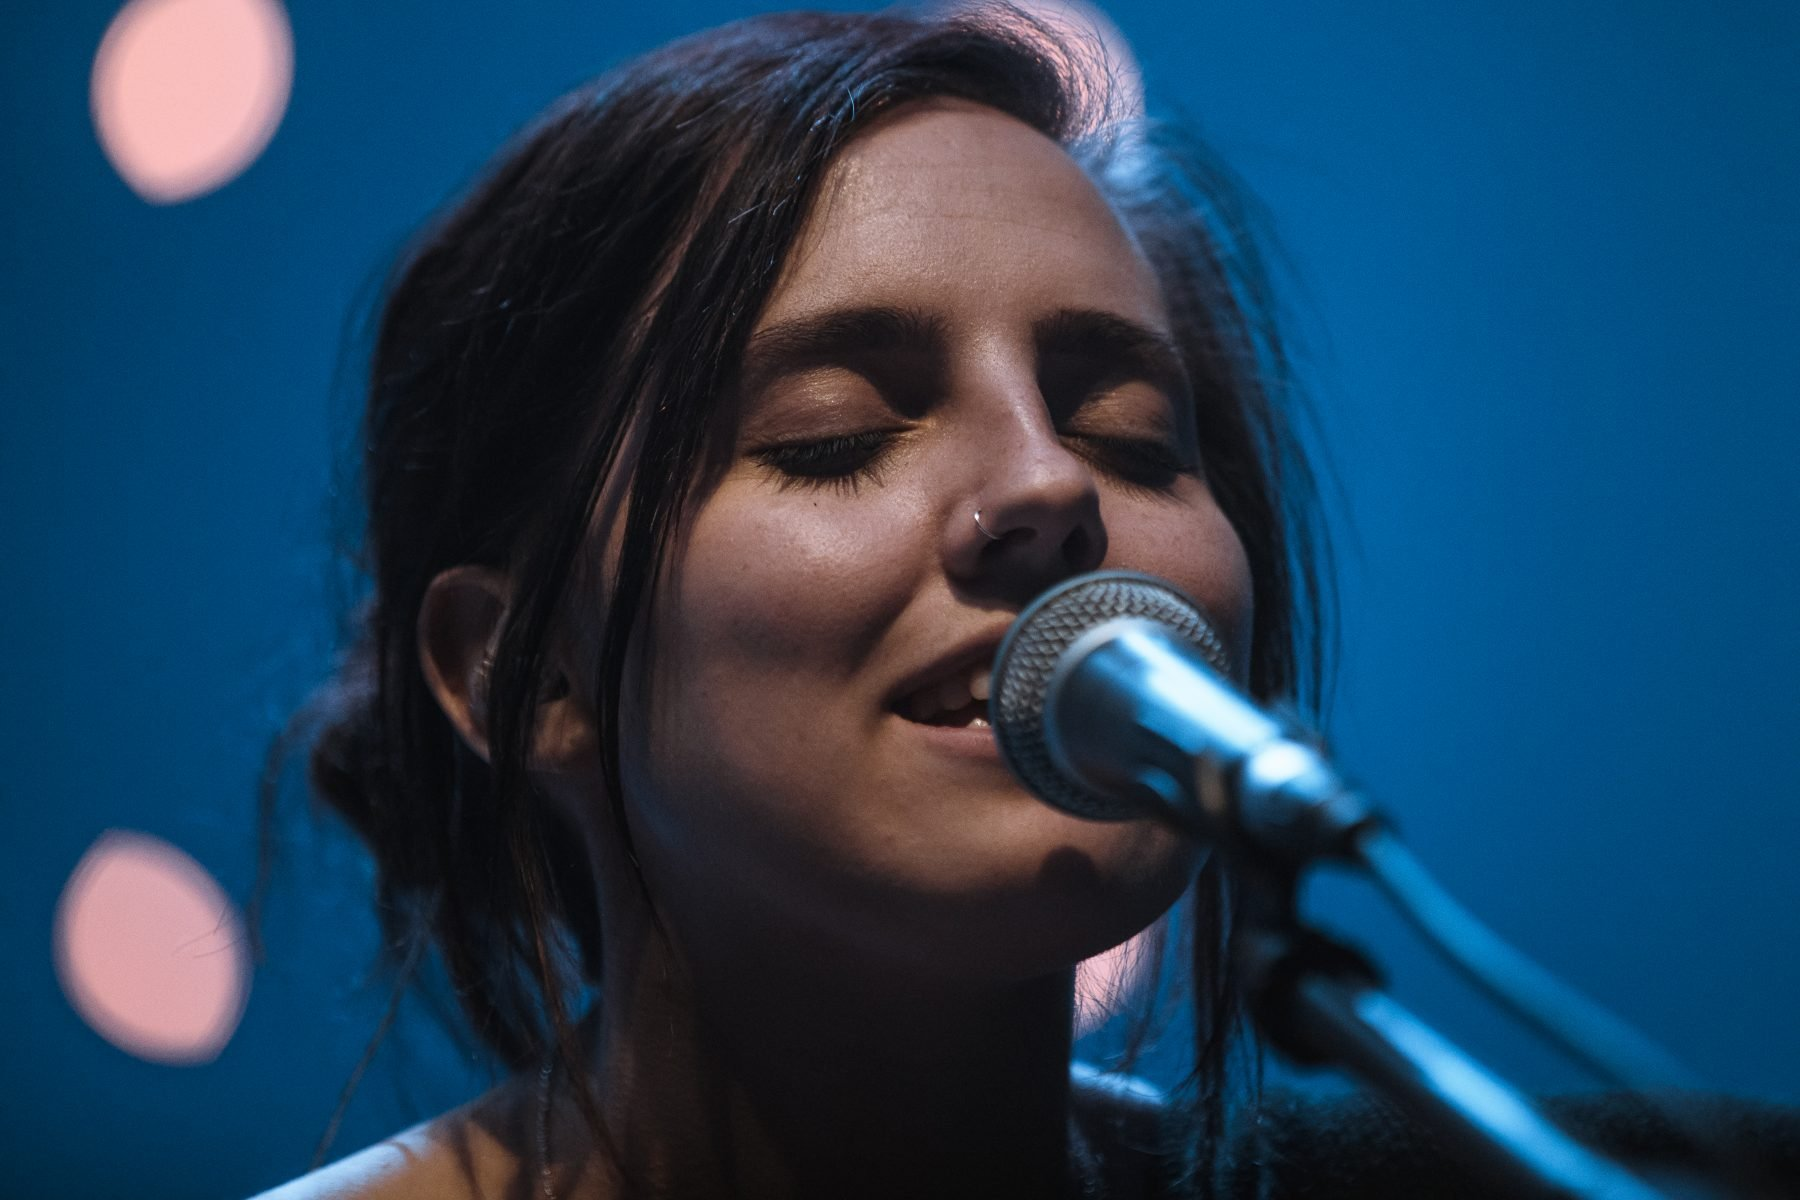 Stephanie Lechamps